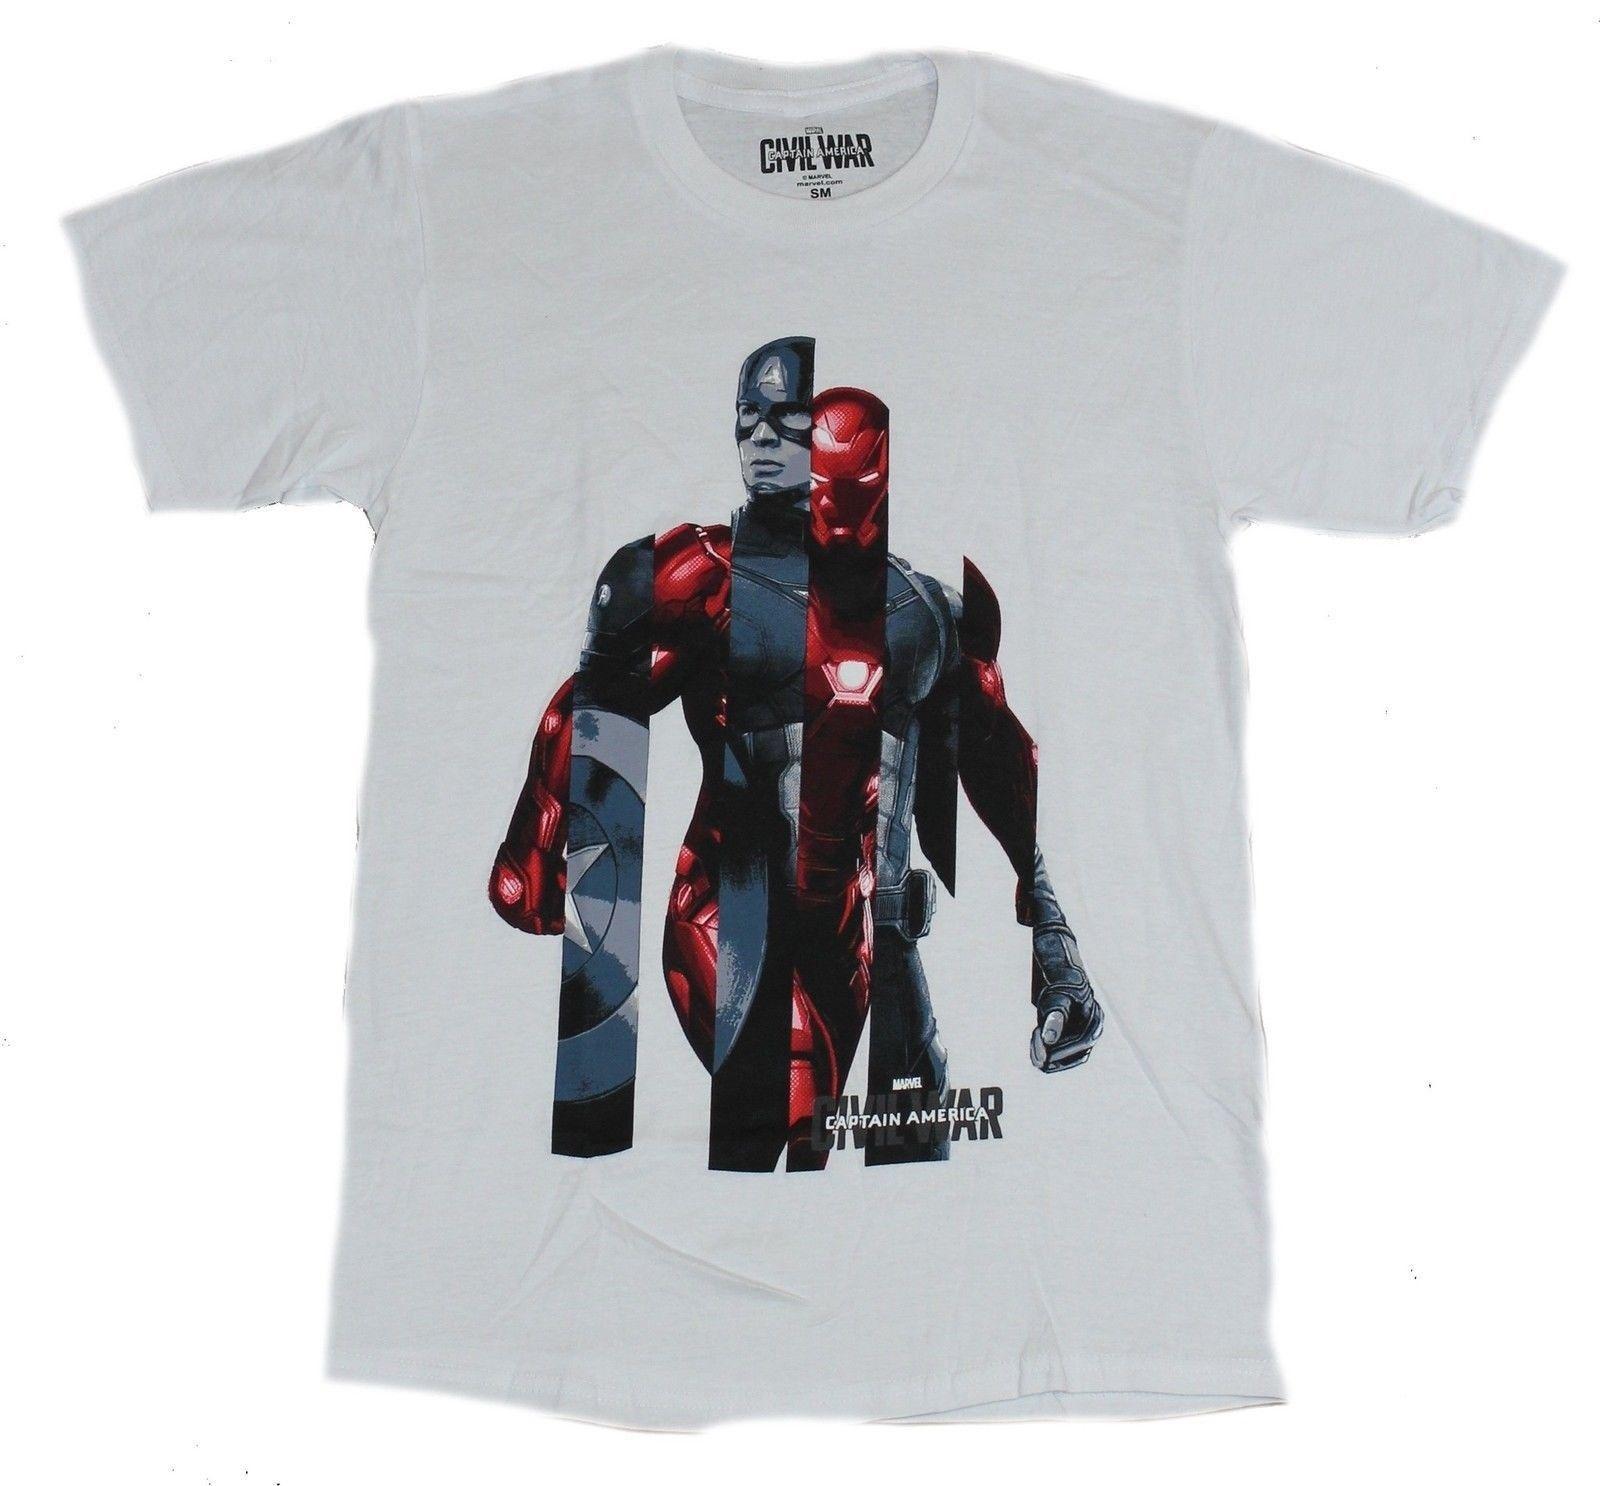 46df57779f Captain America Civil War Mens T Shirt 2 Part Iron Man Cap Interspersed  Image Tee Shirt Designers Funny Print T Shirts From Teevotshirts41